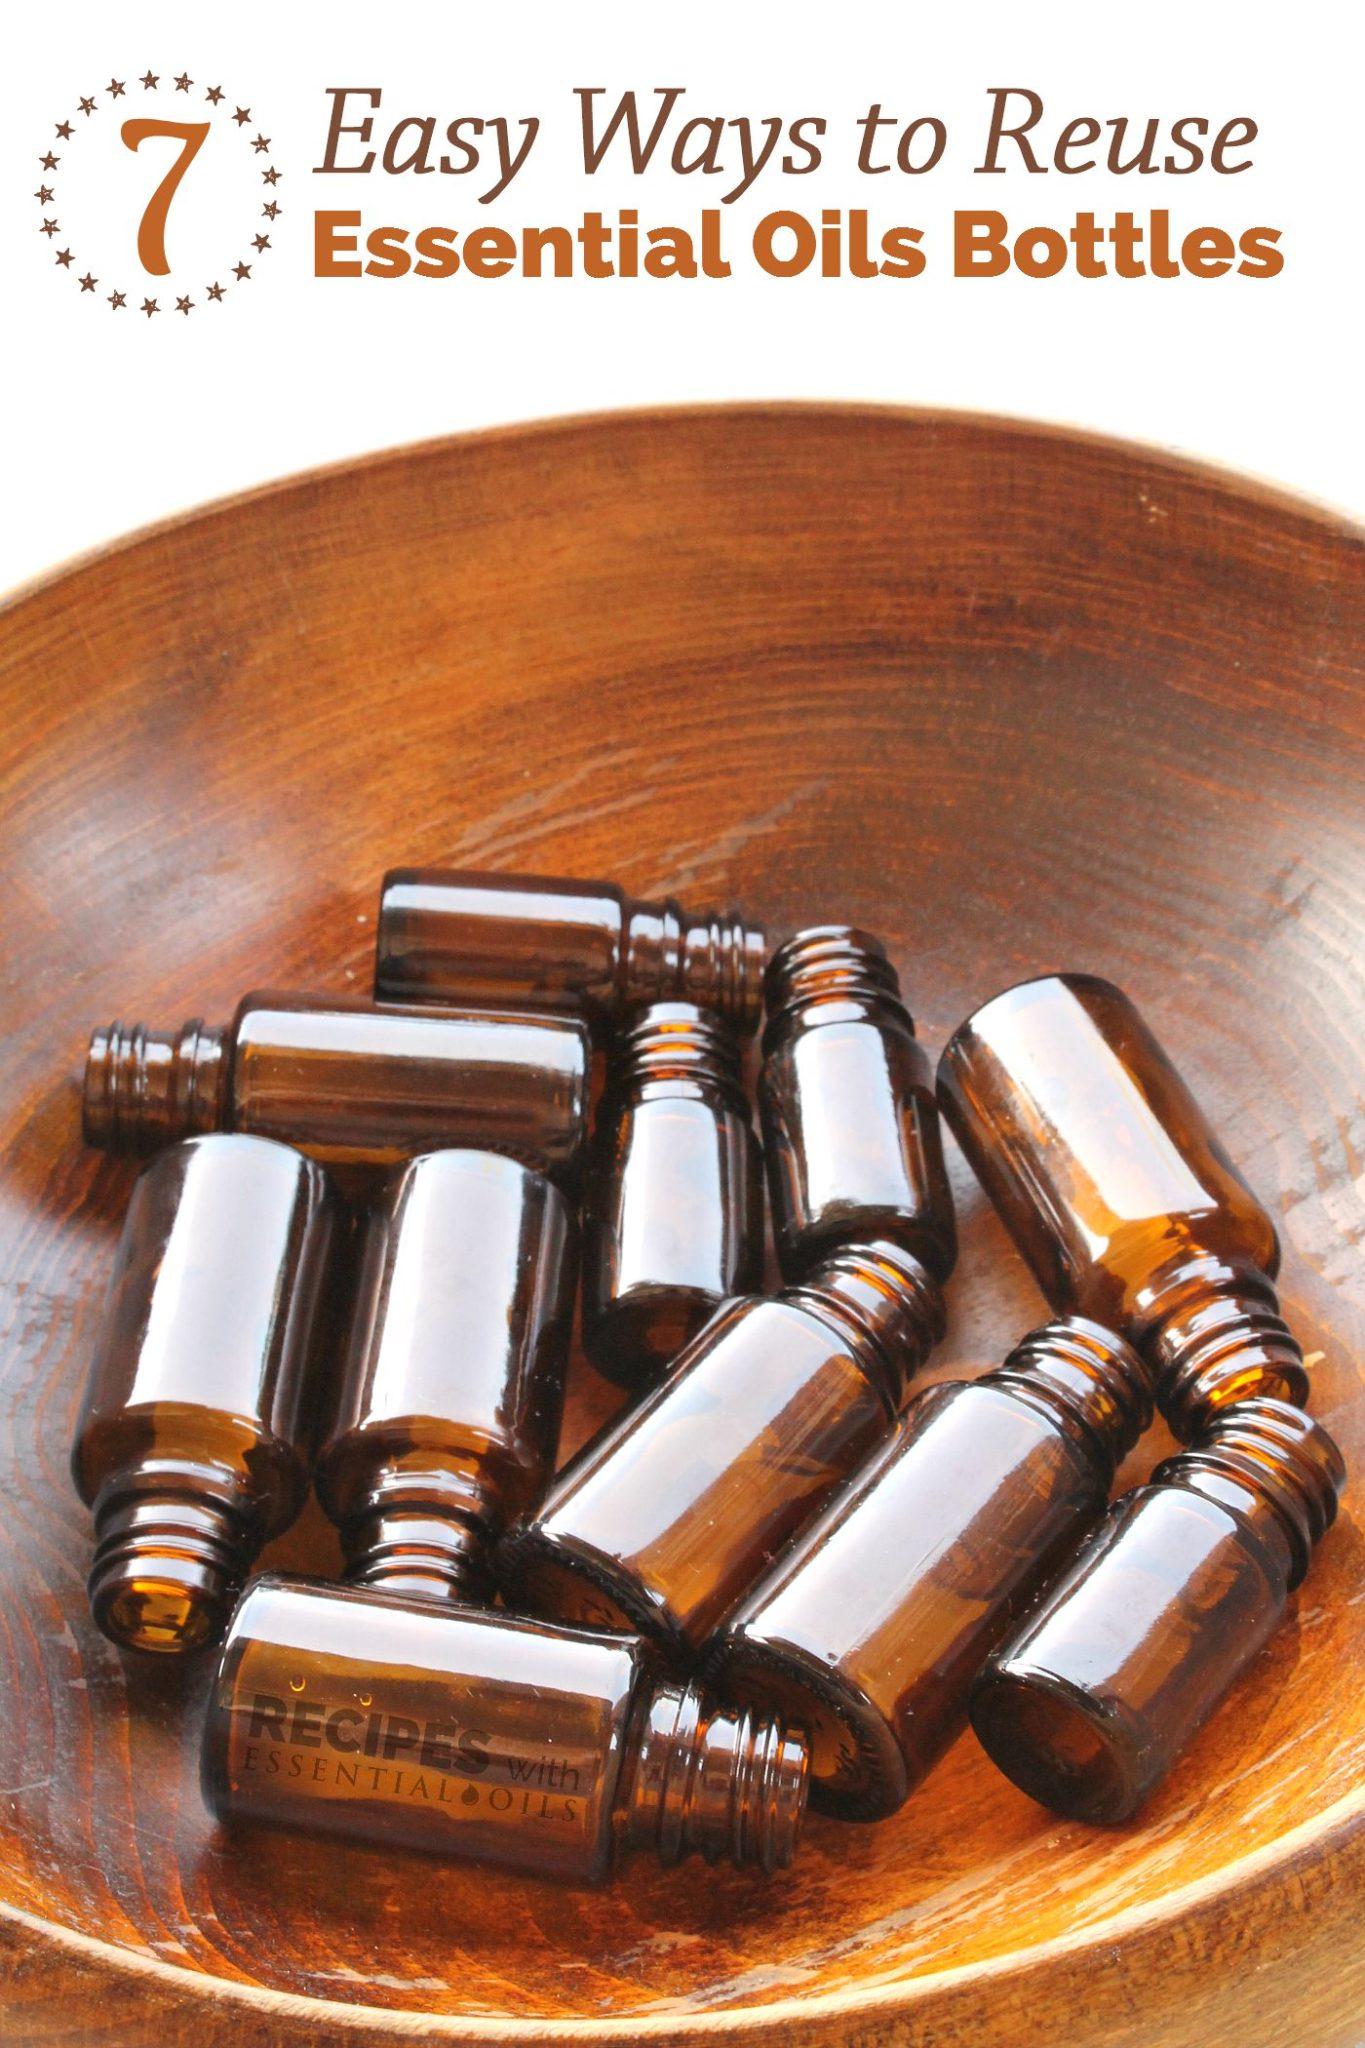 7 Ways To Reuse Essential Oils Bottles from RecipesWithEssentialOils.com